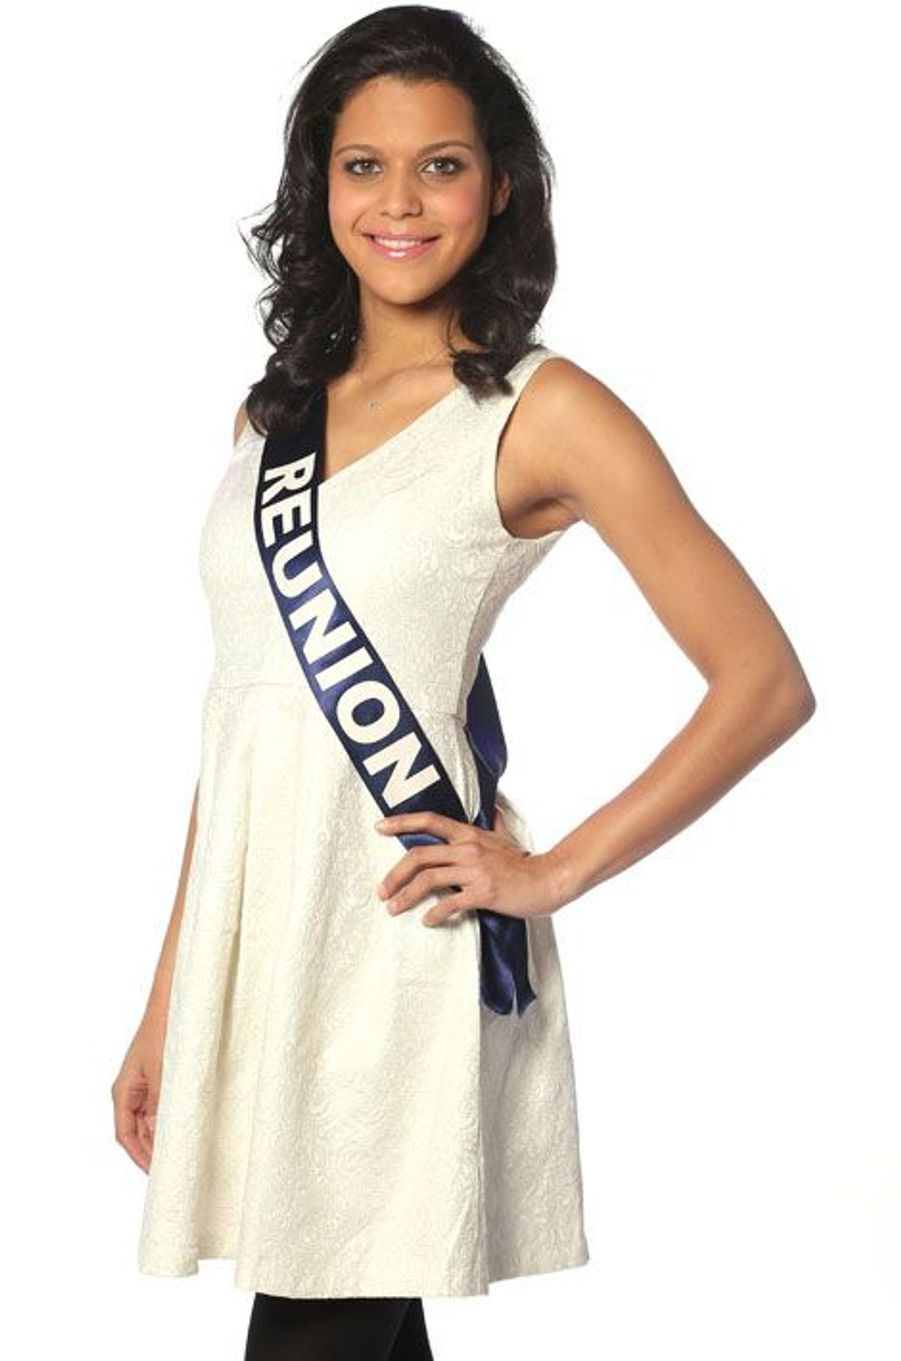 Vanille M'doihama, 21 ans, Miss Réunion